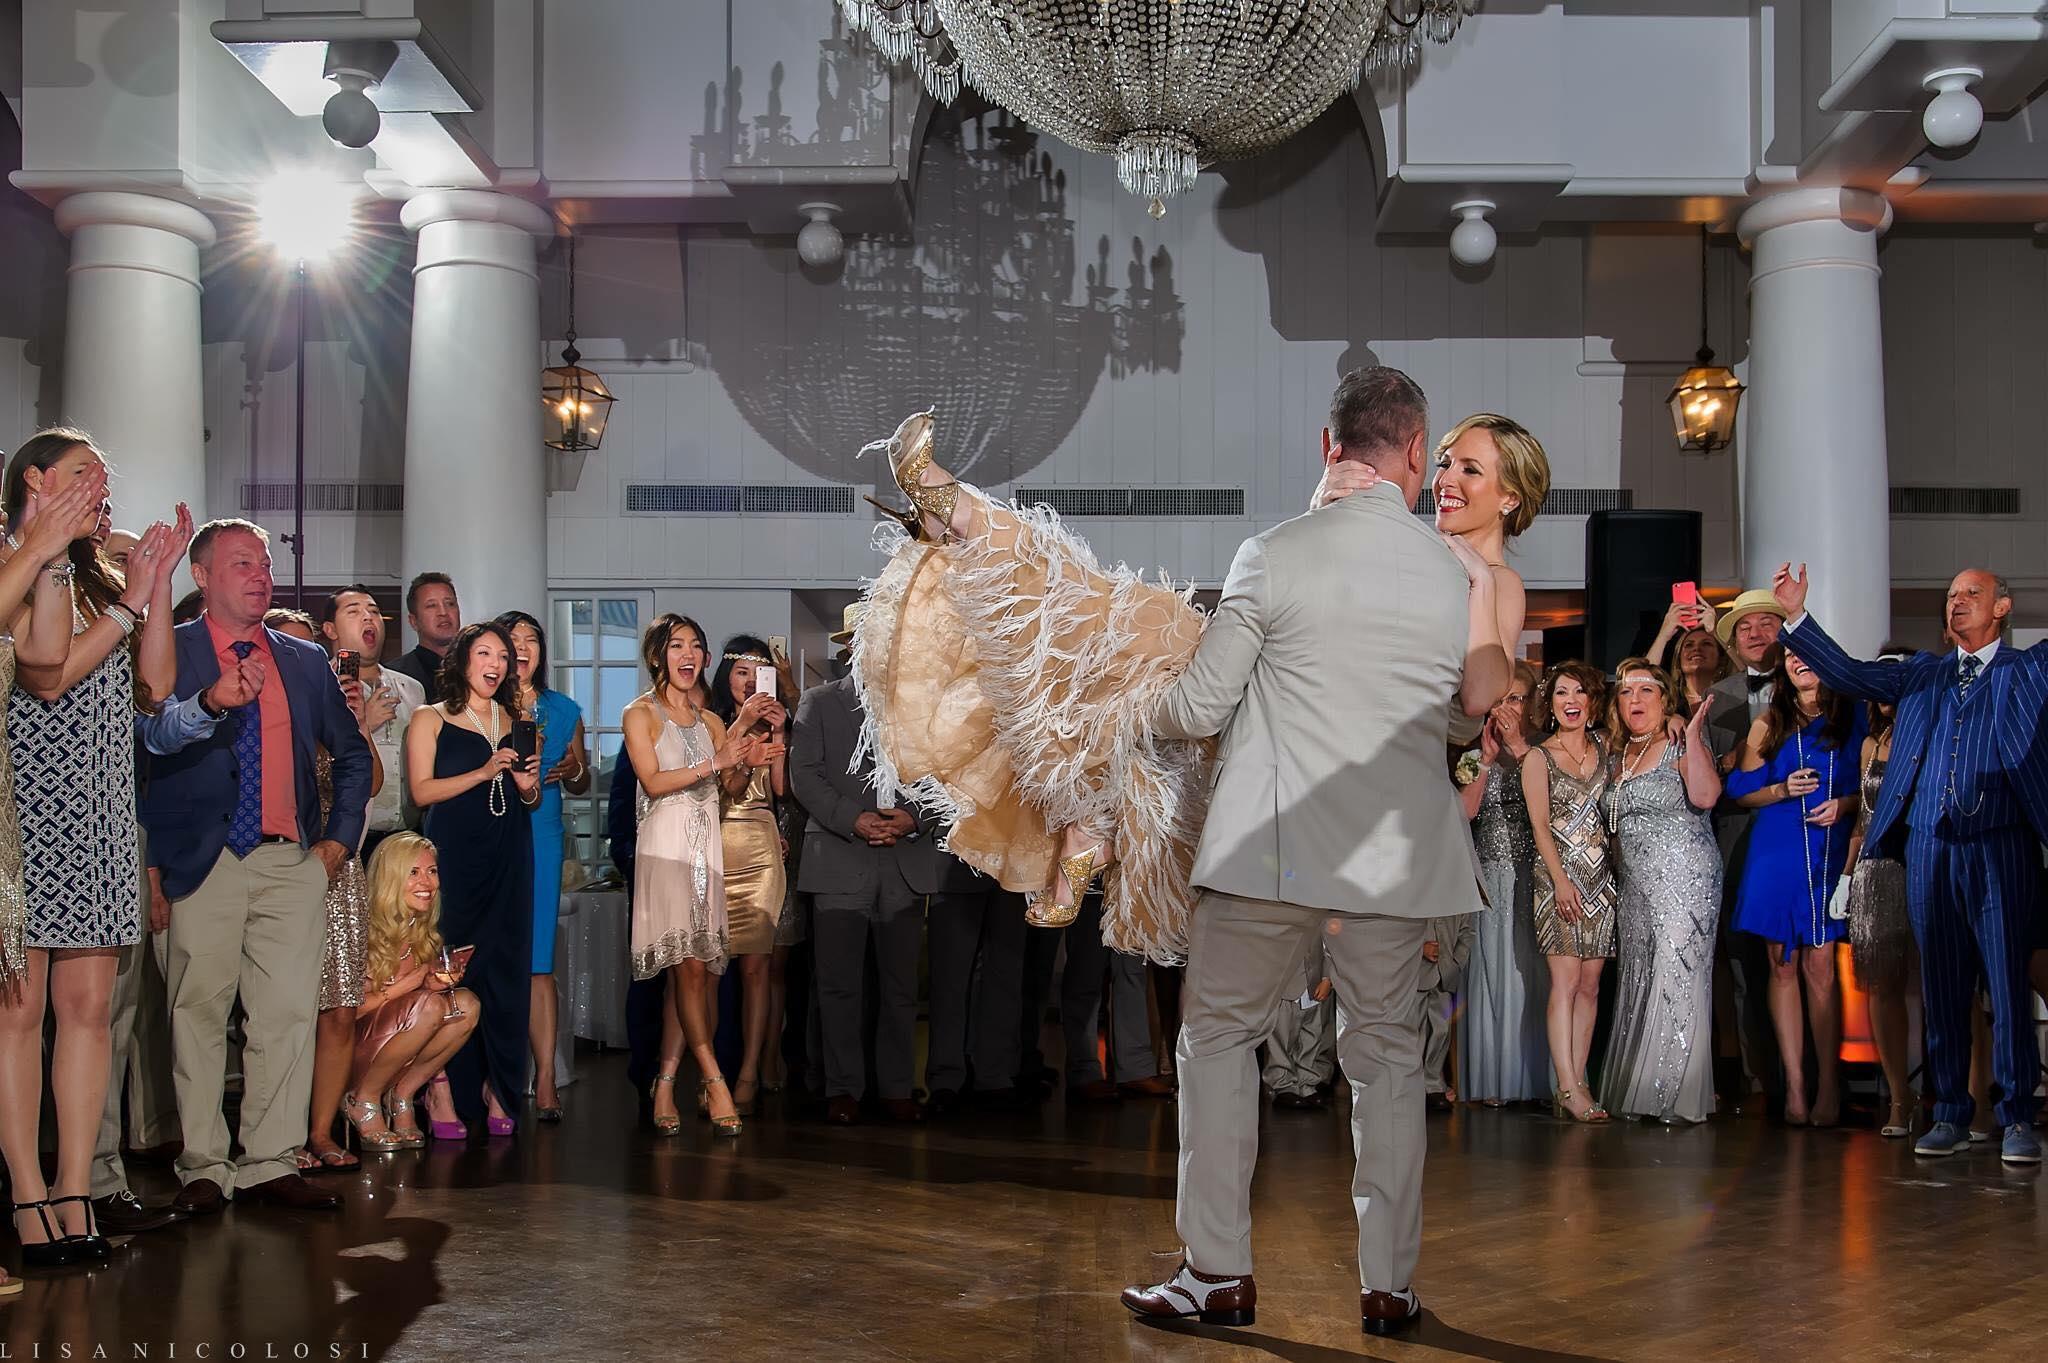 East End DJs Entertaiment Weddings Lisa Nicolosi Photographer at Oceanbleu